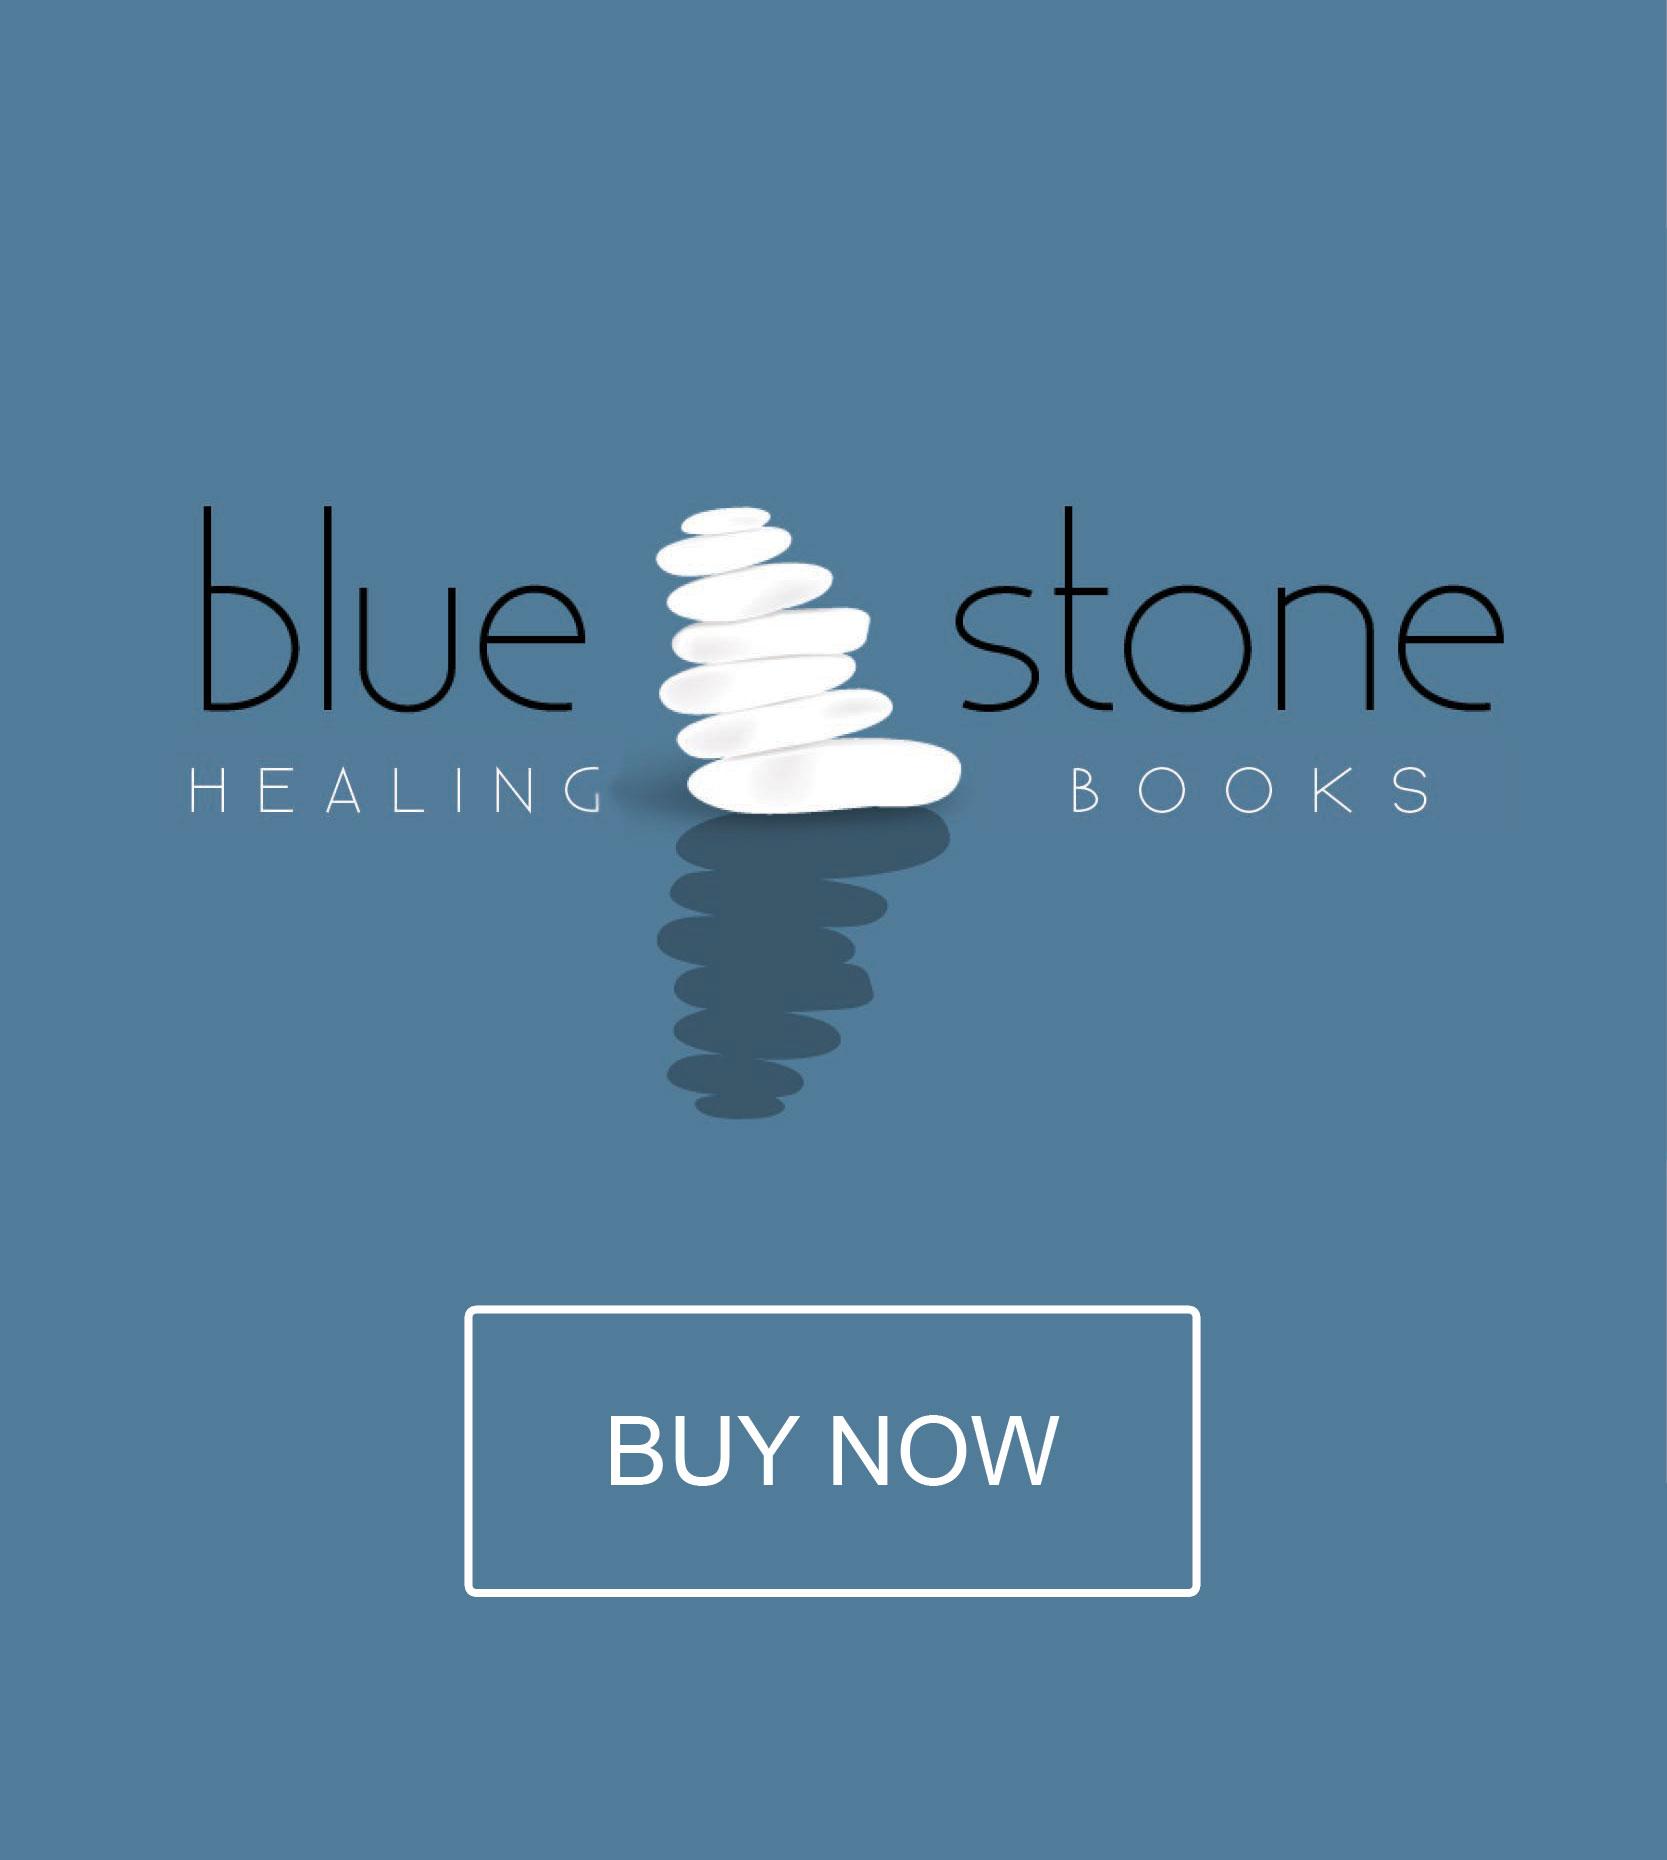 Blue Stone Healing Books Logo